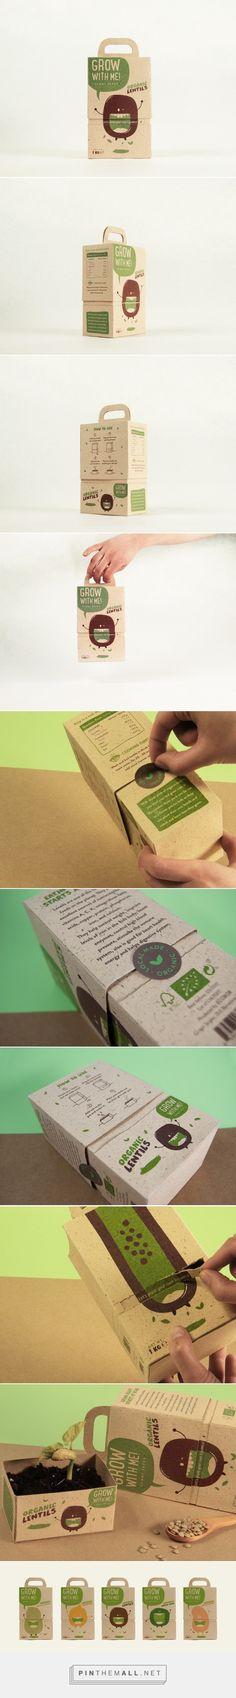 Grow With Me! / Ecopackaging project/ designed by Cristina Castells, Maria Fernanda Peña, Andrea Ribera